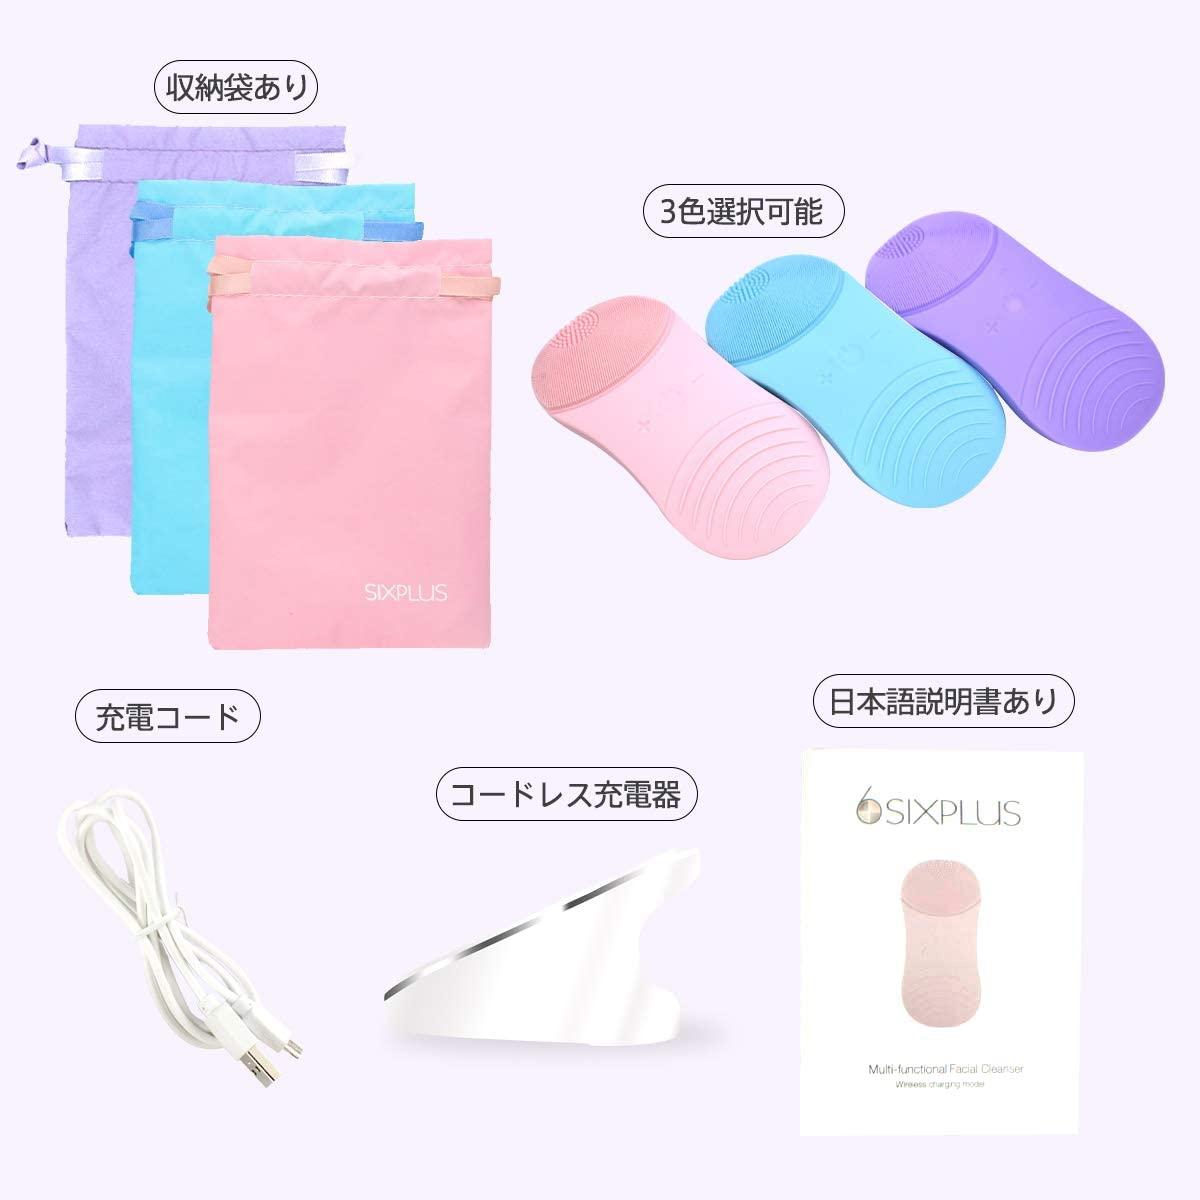 SIXPLUS(シックスプラス) 多機能洗顔器の商品画像7